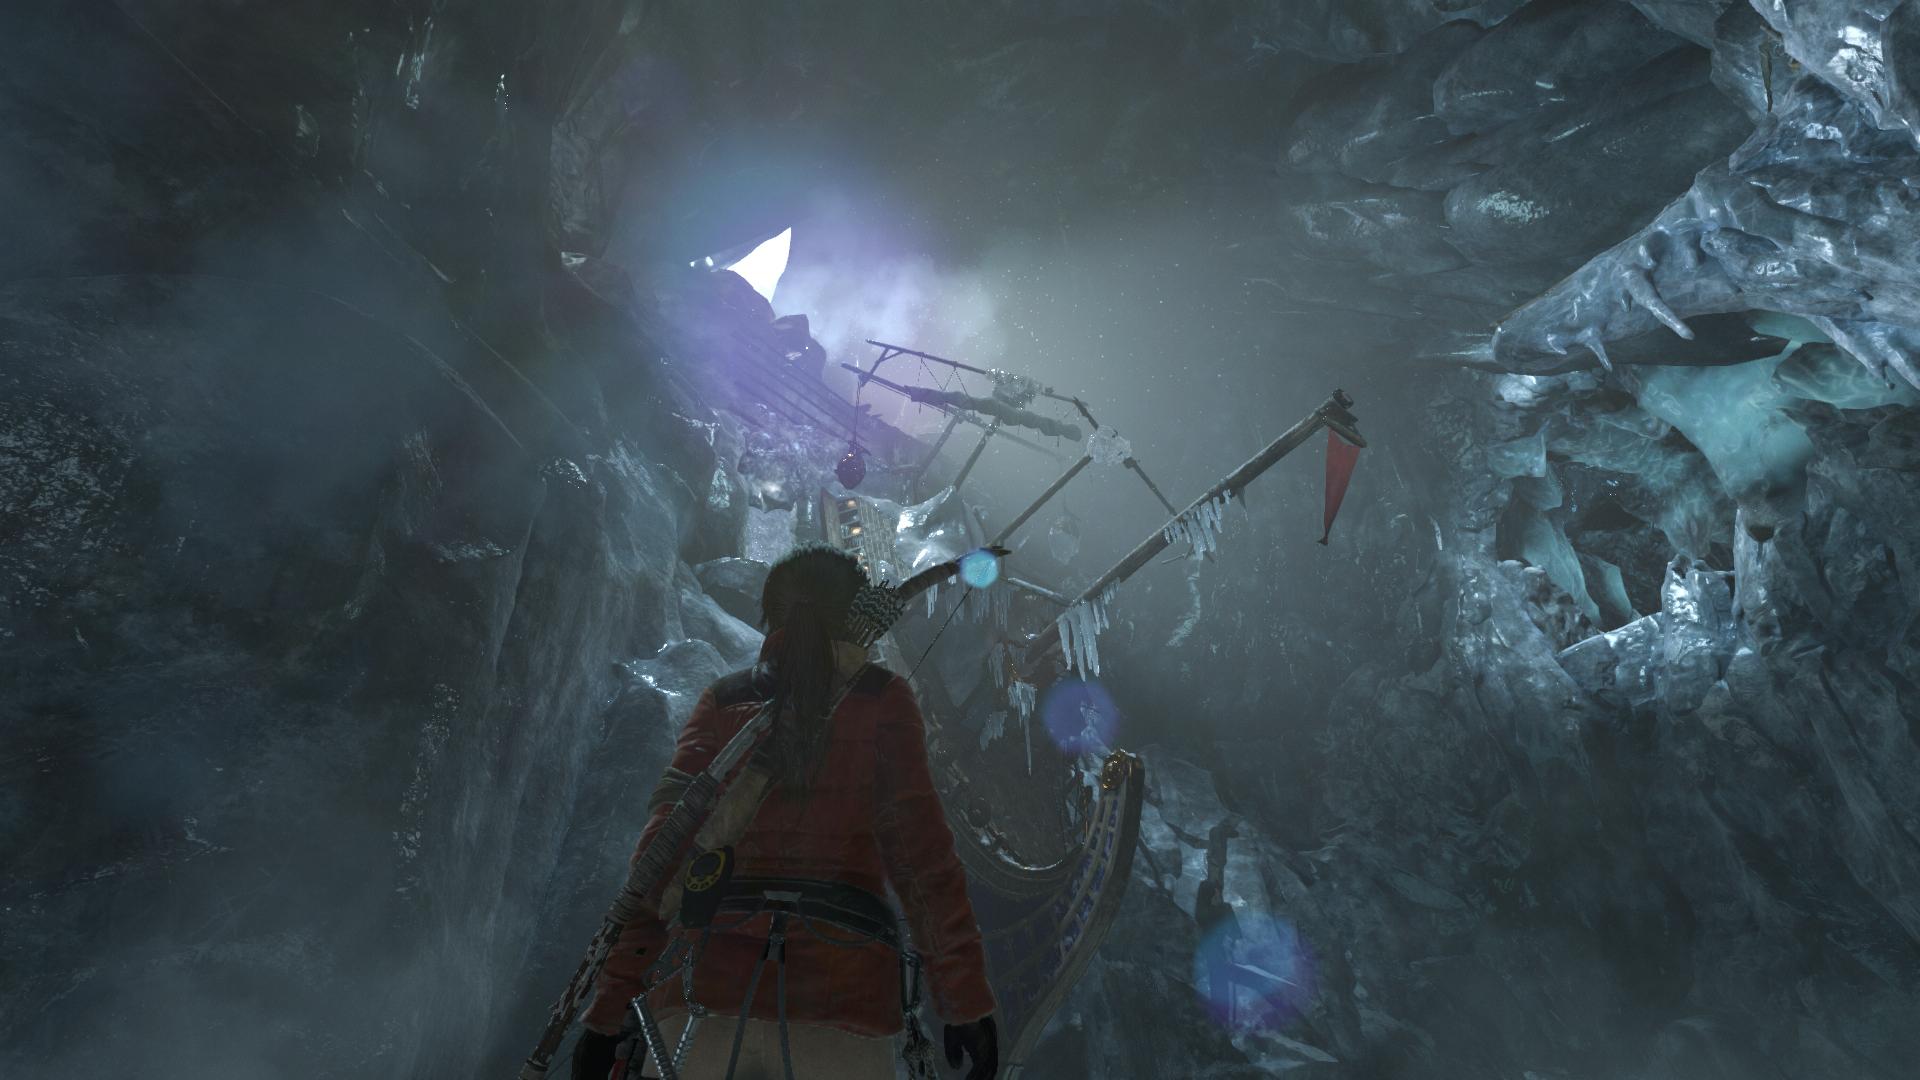 Wallpaper Lara Croft Tomb Raider Rise Of The Tomb Raider